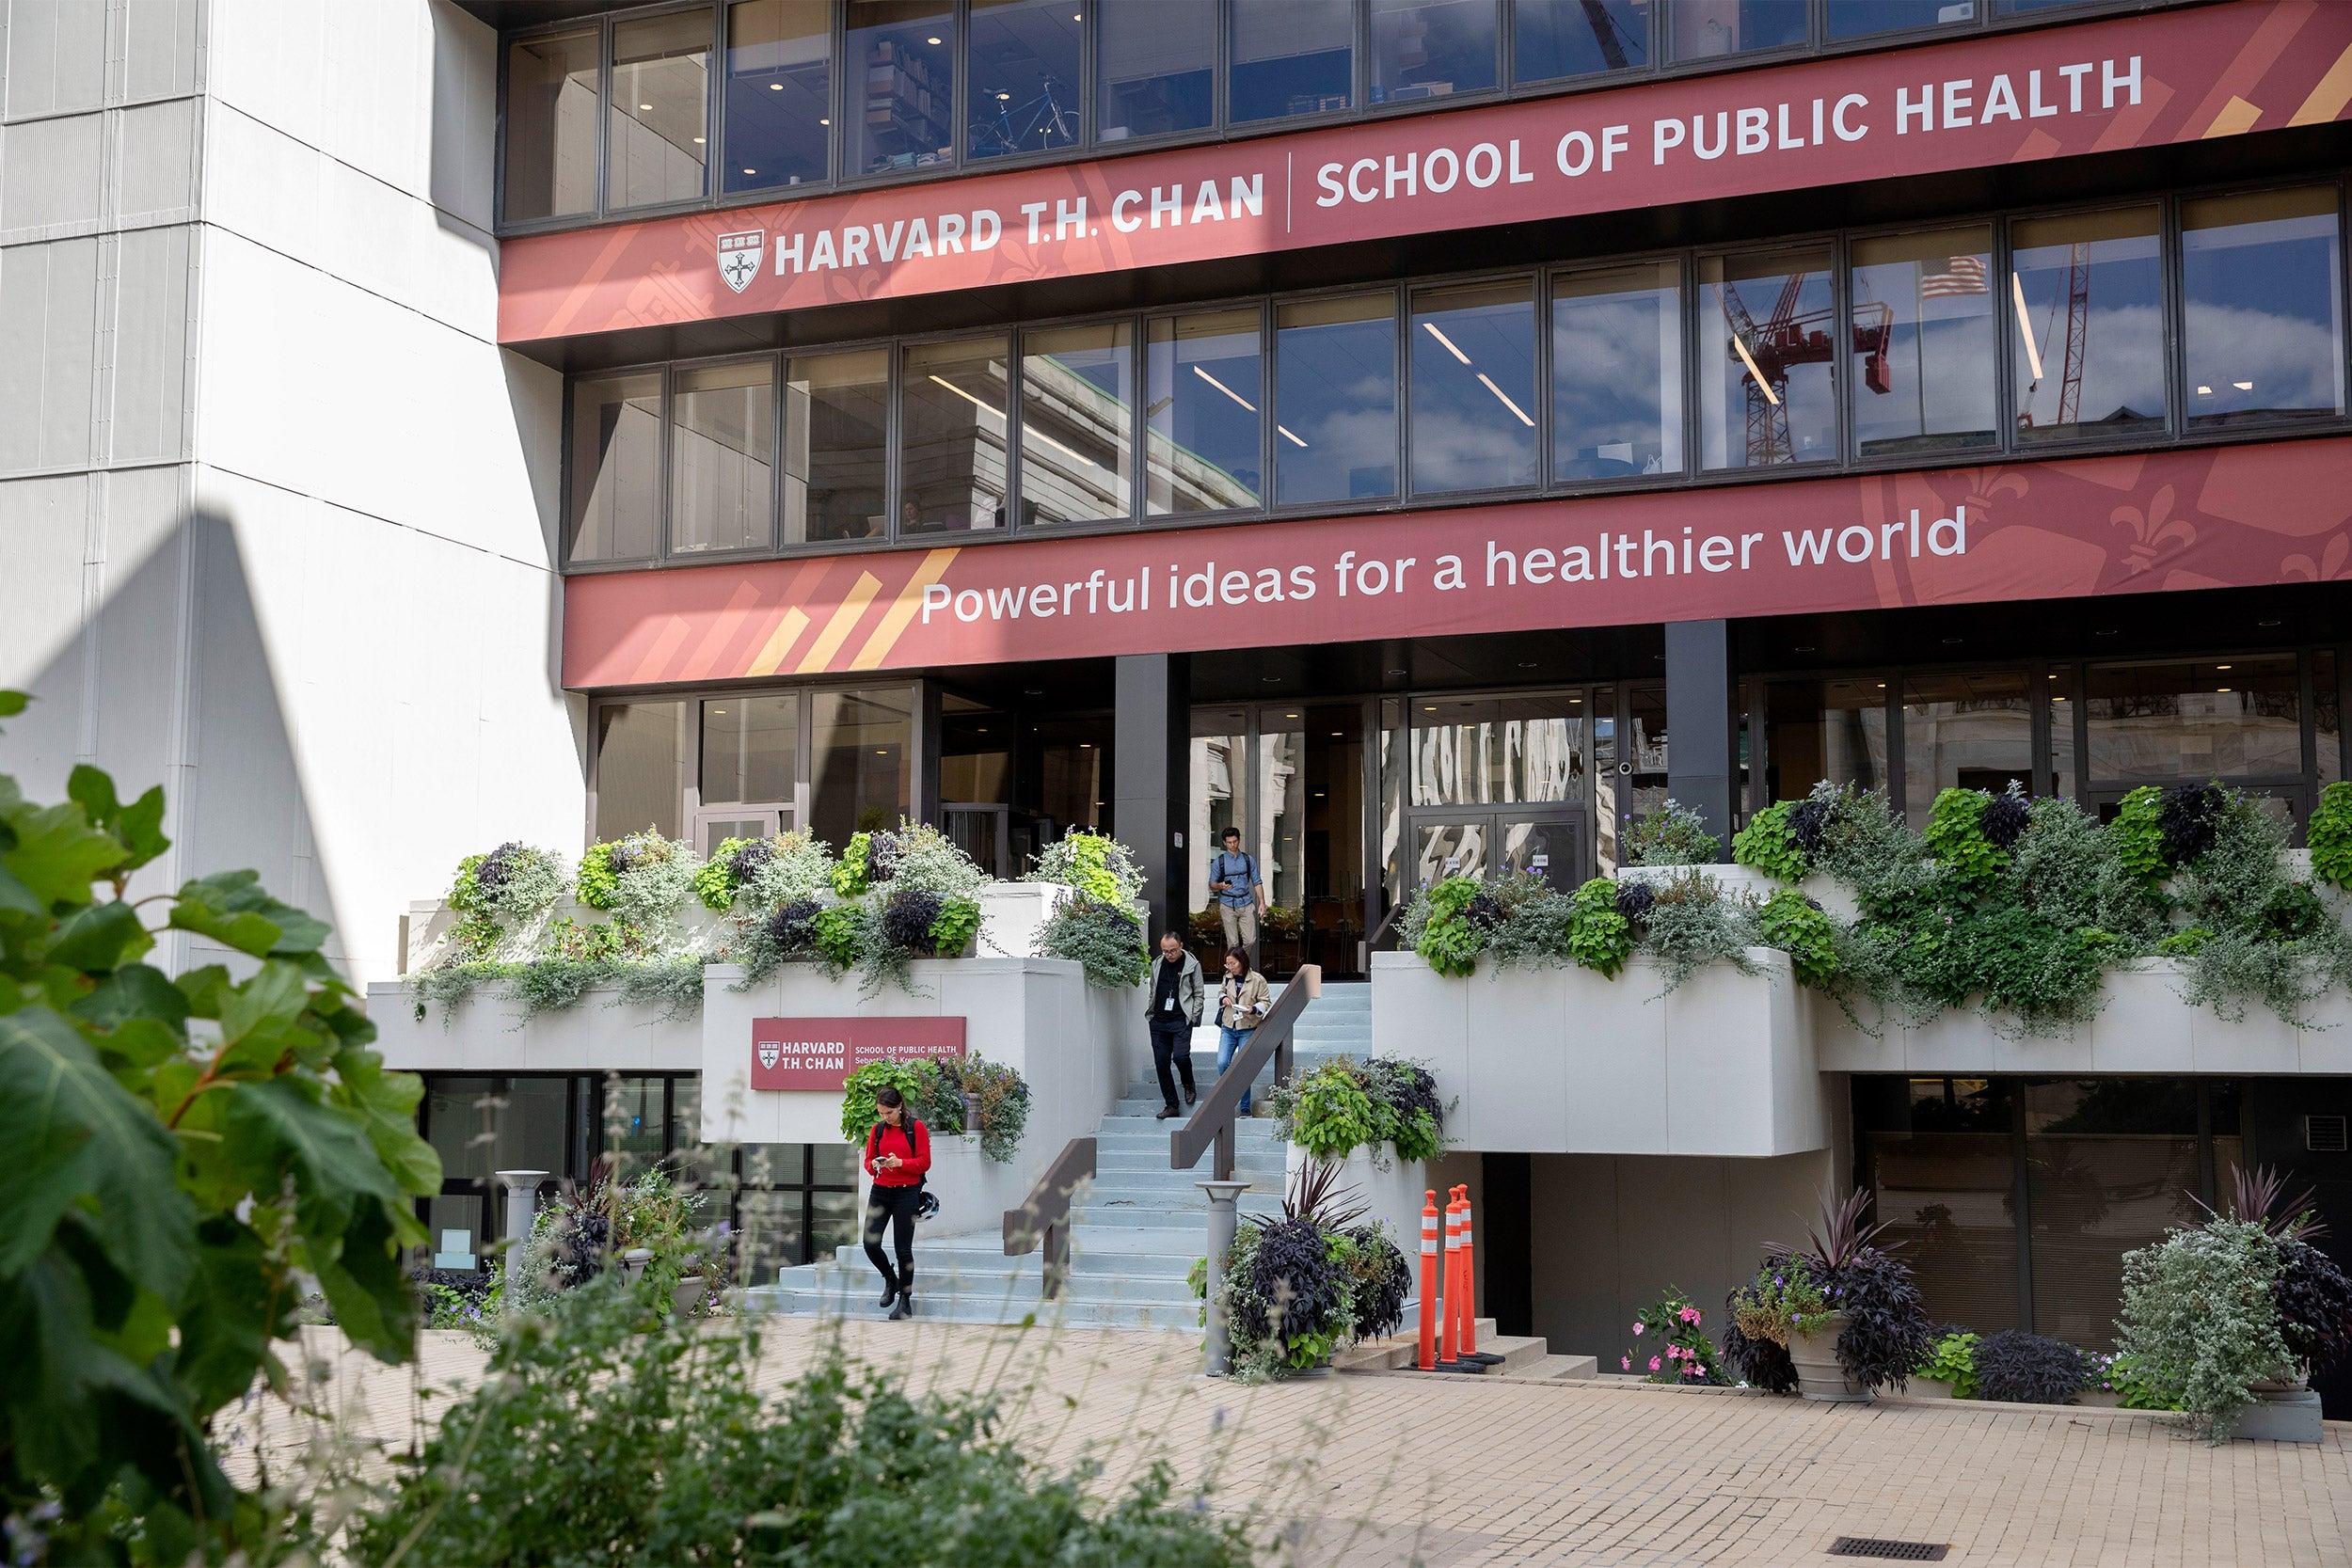 Harvard T.H. Chan Public School of Health.